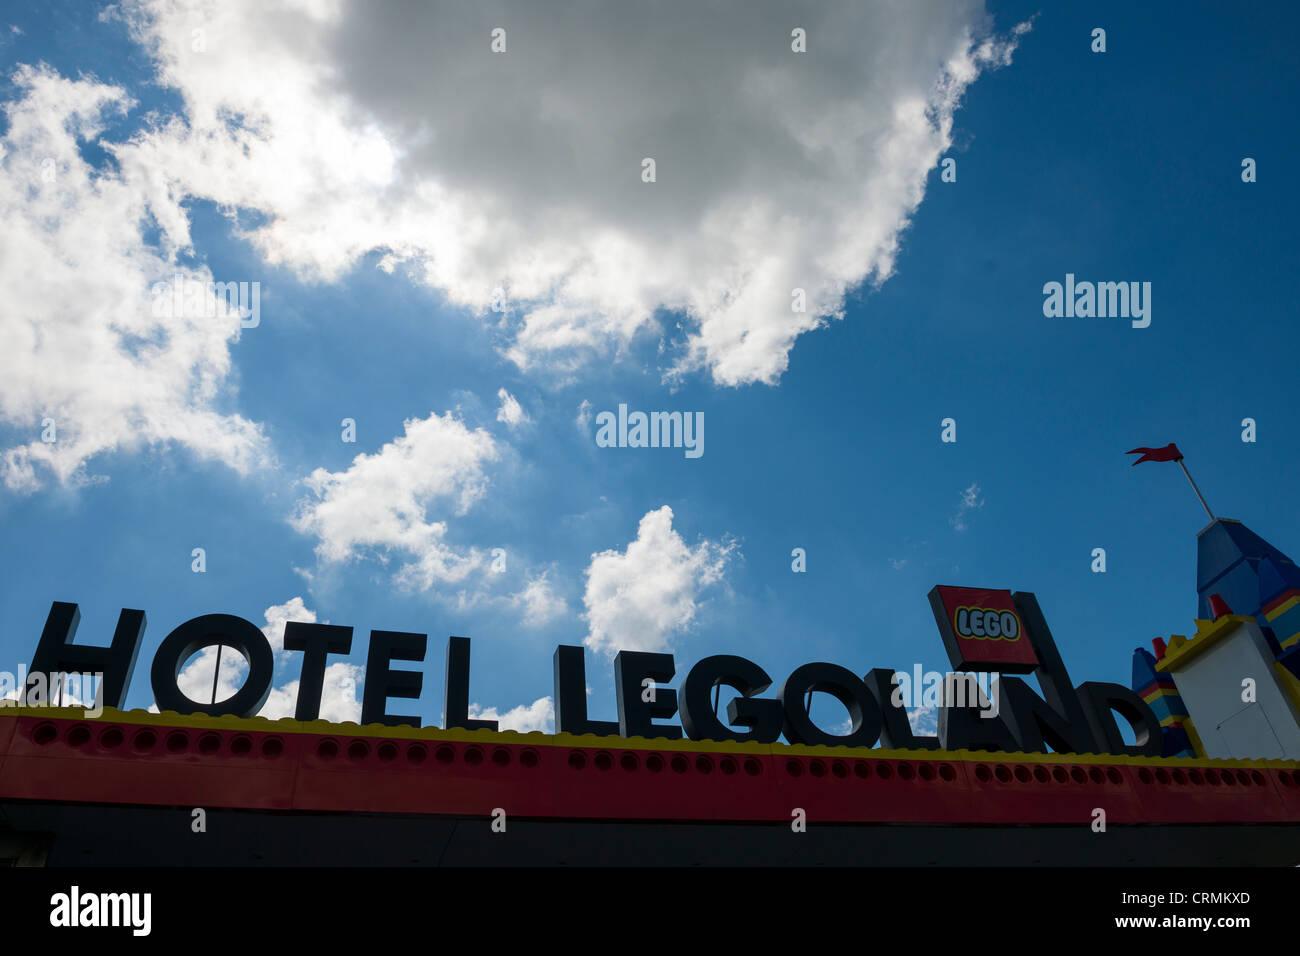 Exterior sign of the Hotel Legoland, Legoland, Billund, Denmark - Stock Image